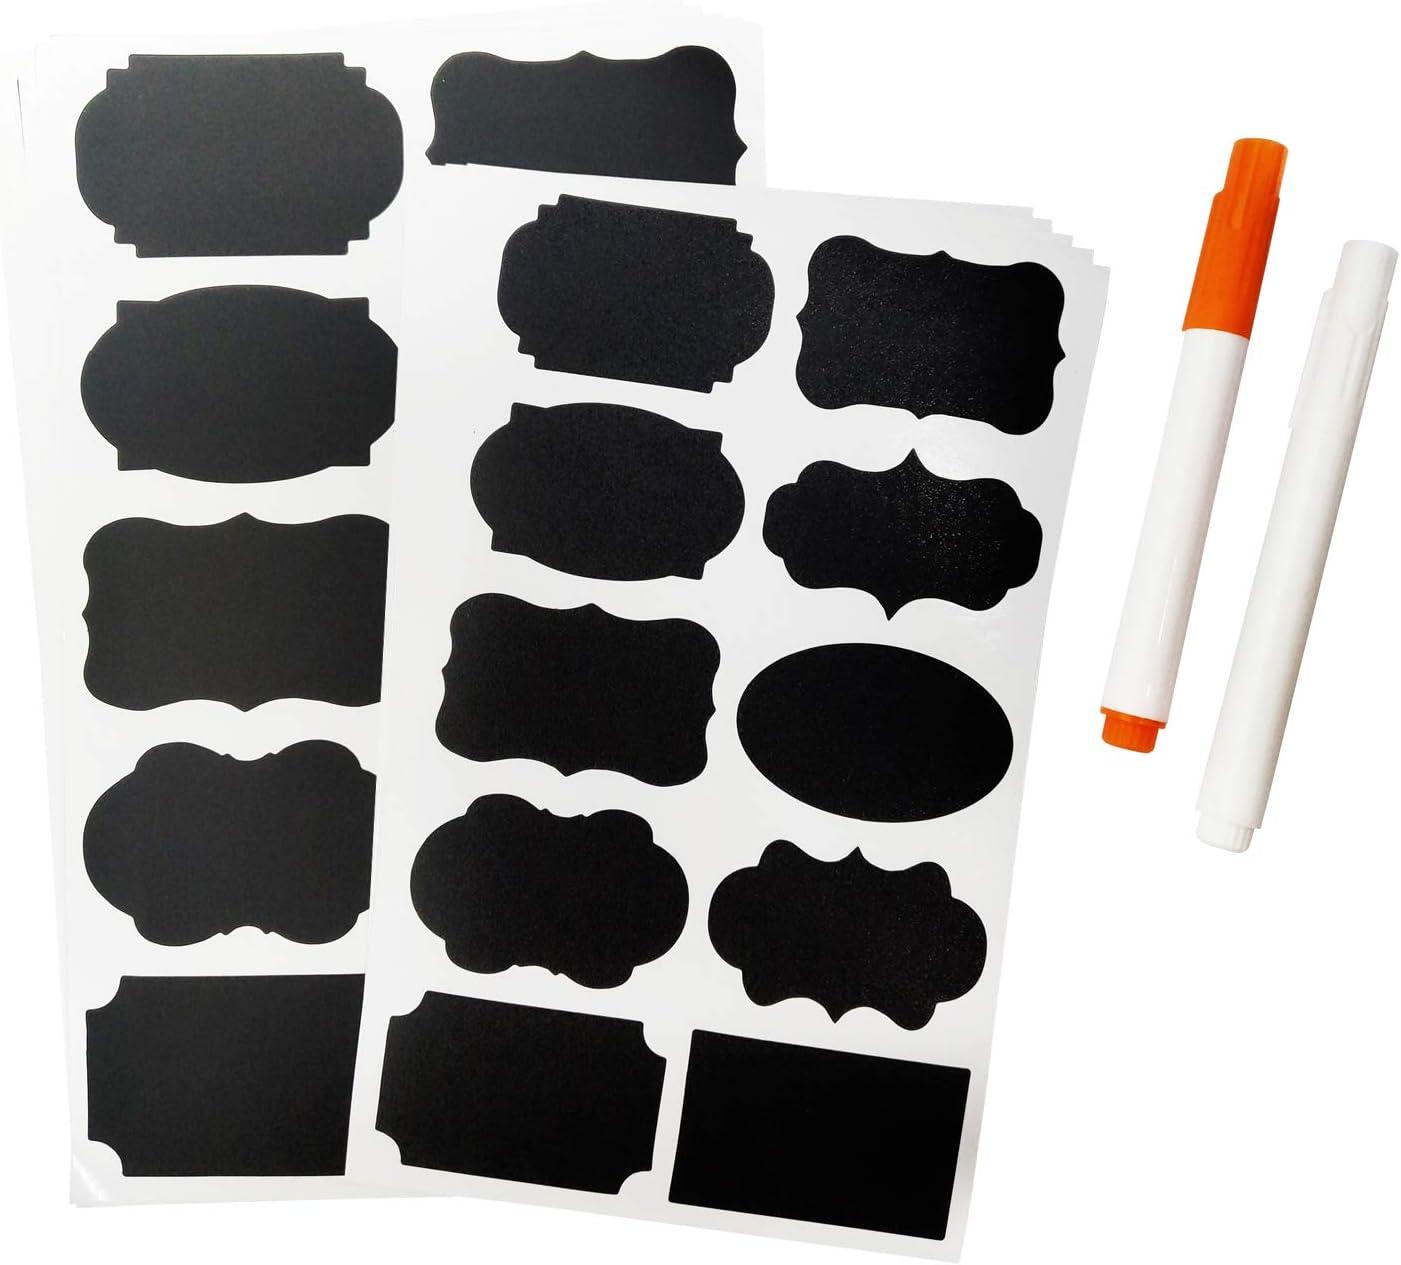 100 PCS Chalkboard Labels with 2 PCS of Free Erasable Chalk Pen, Dishwasher Safe Chalk Board Mason Jar Labels, Reusable and Removable Waterproof Blackboard Sticker Label, 2 Size